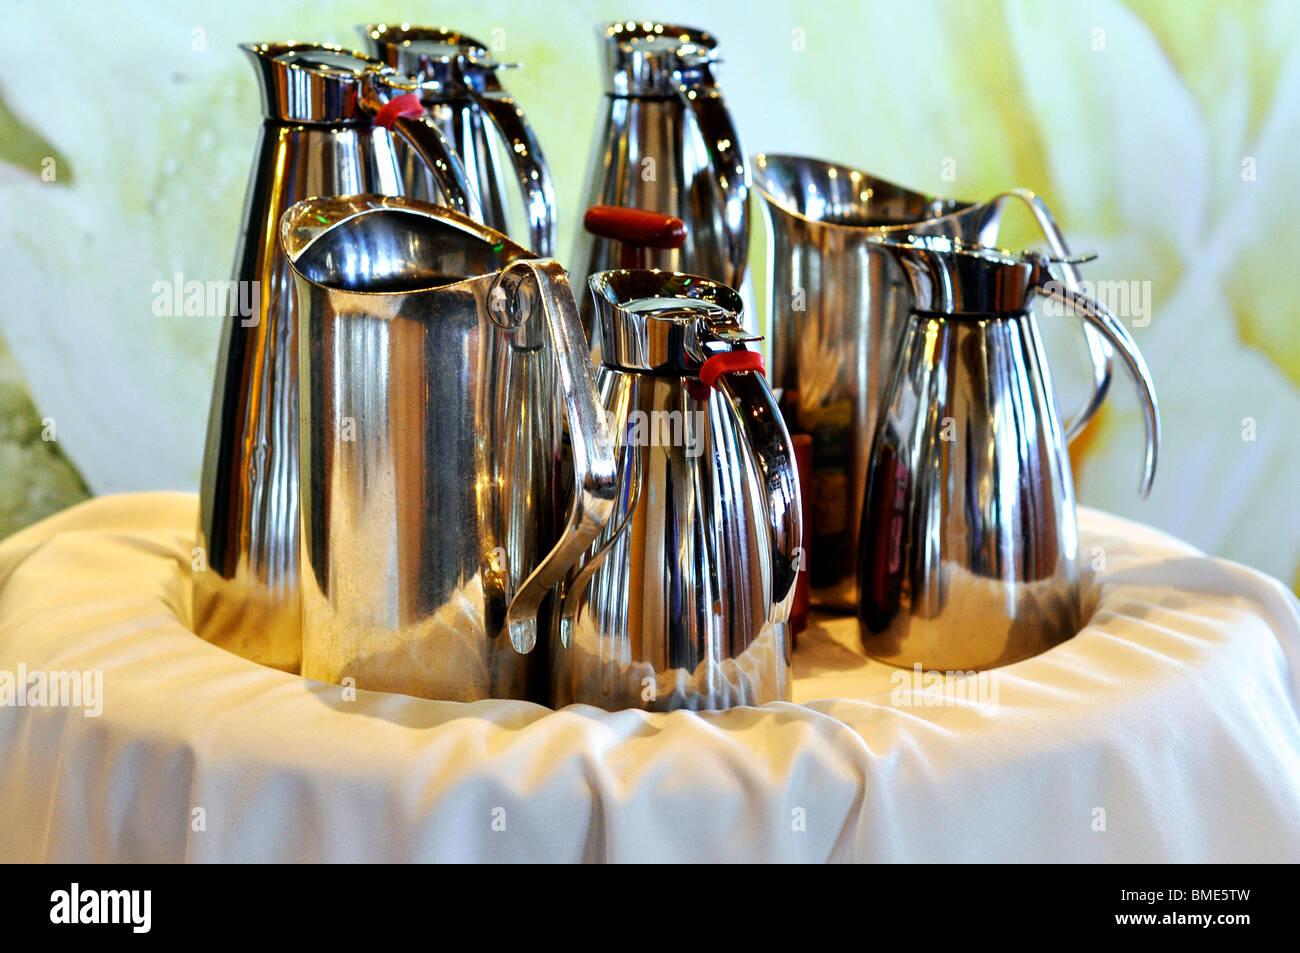 Tea and Coffee Pots - Stock Image